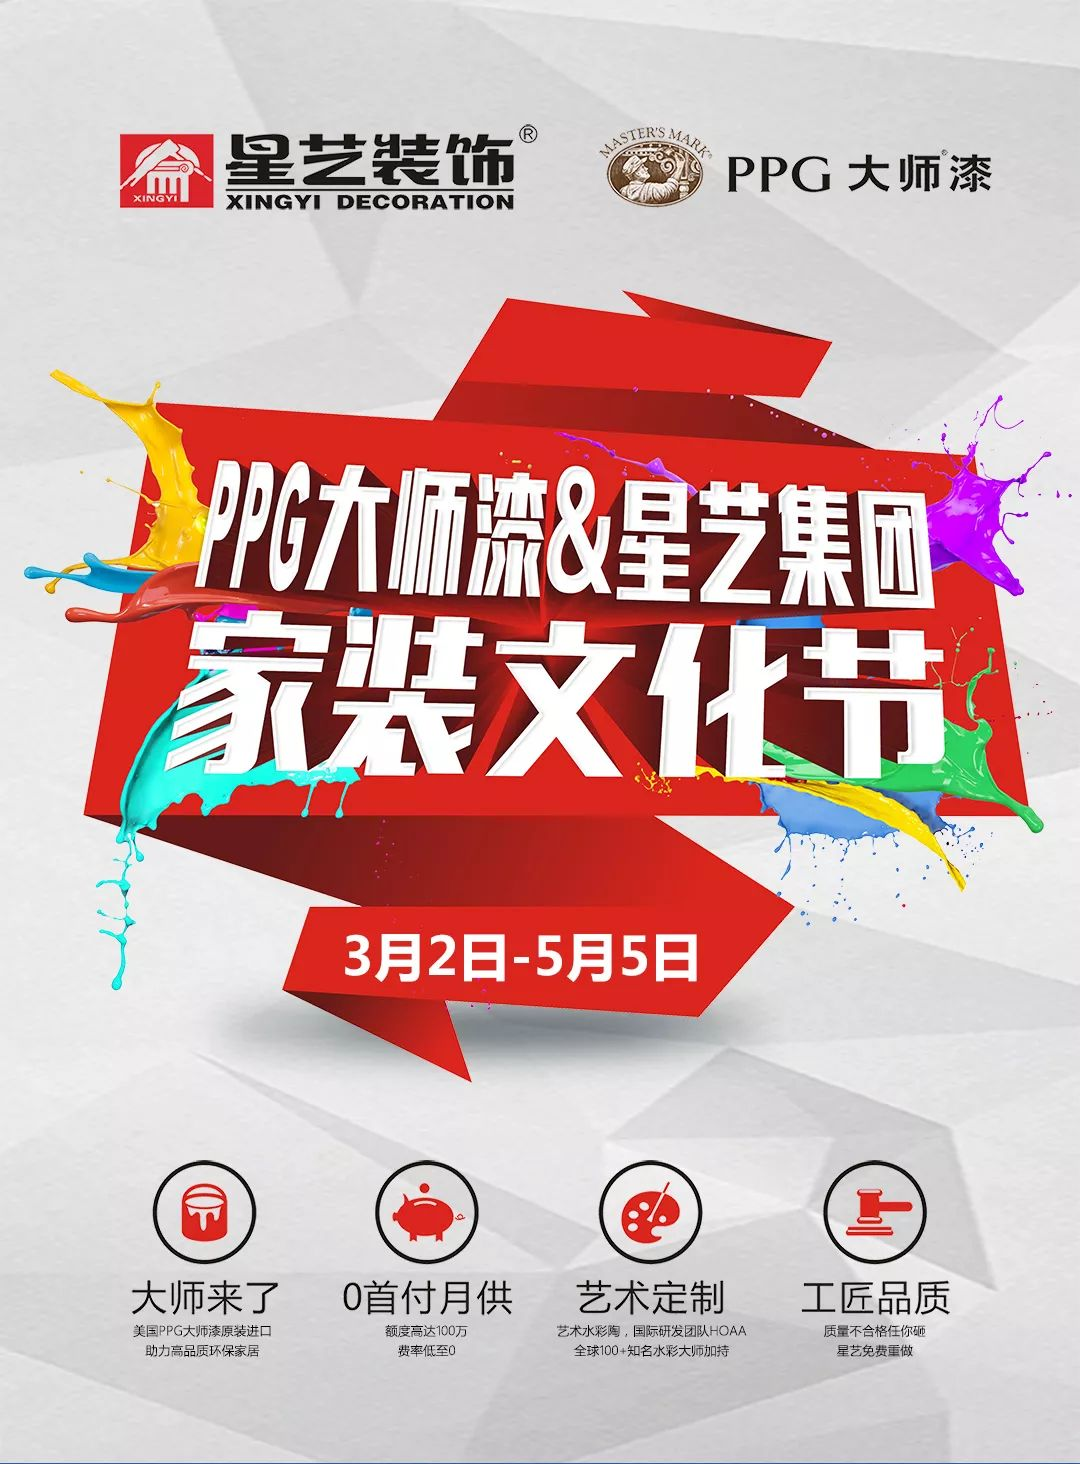 //xystcdn.xydec.com.cn/uploadfiles/image/20190228/78f33a9eef4f15e56808534a51c3541d.jpg